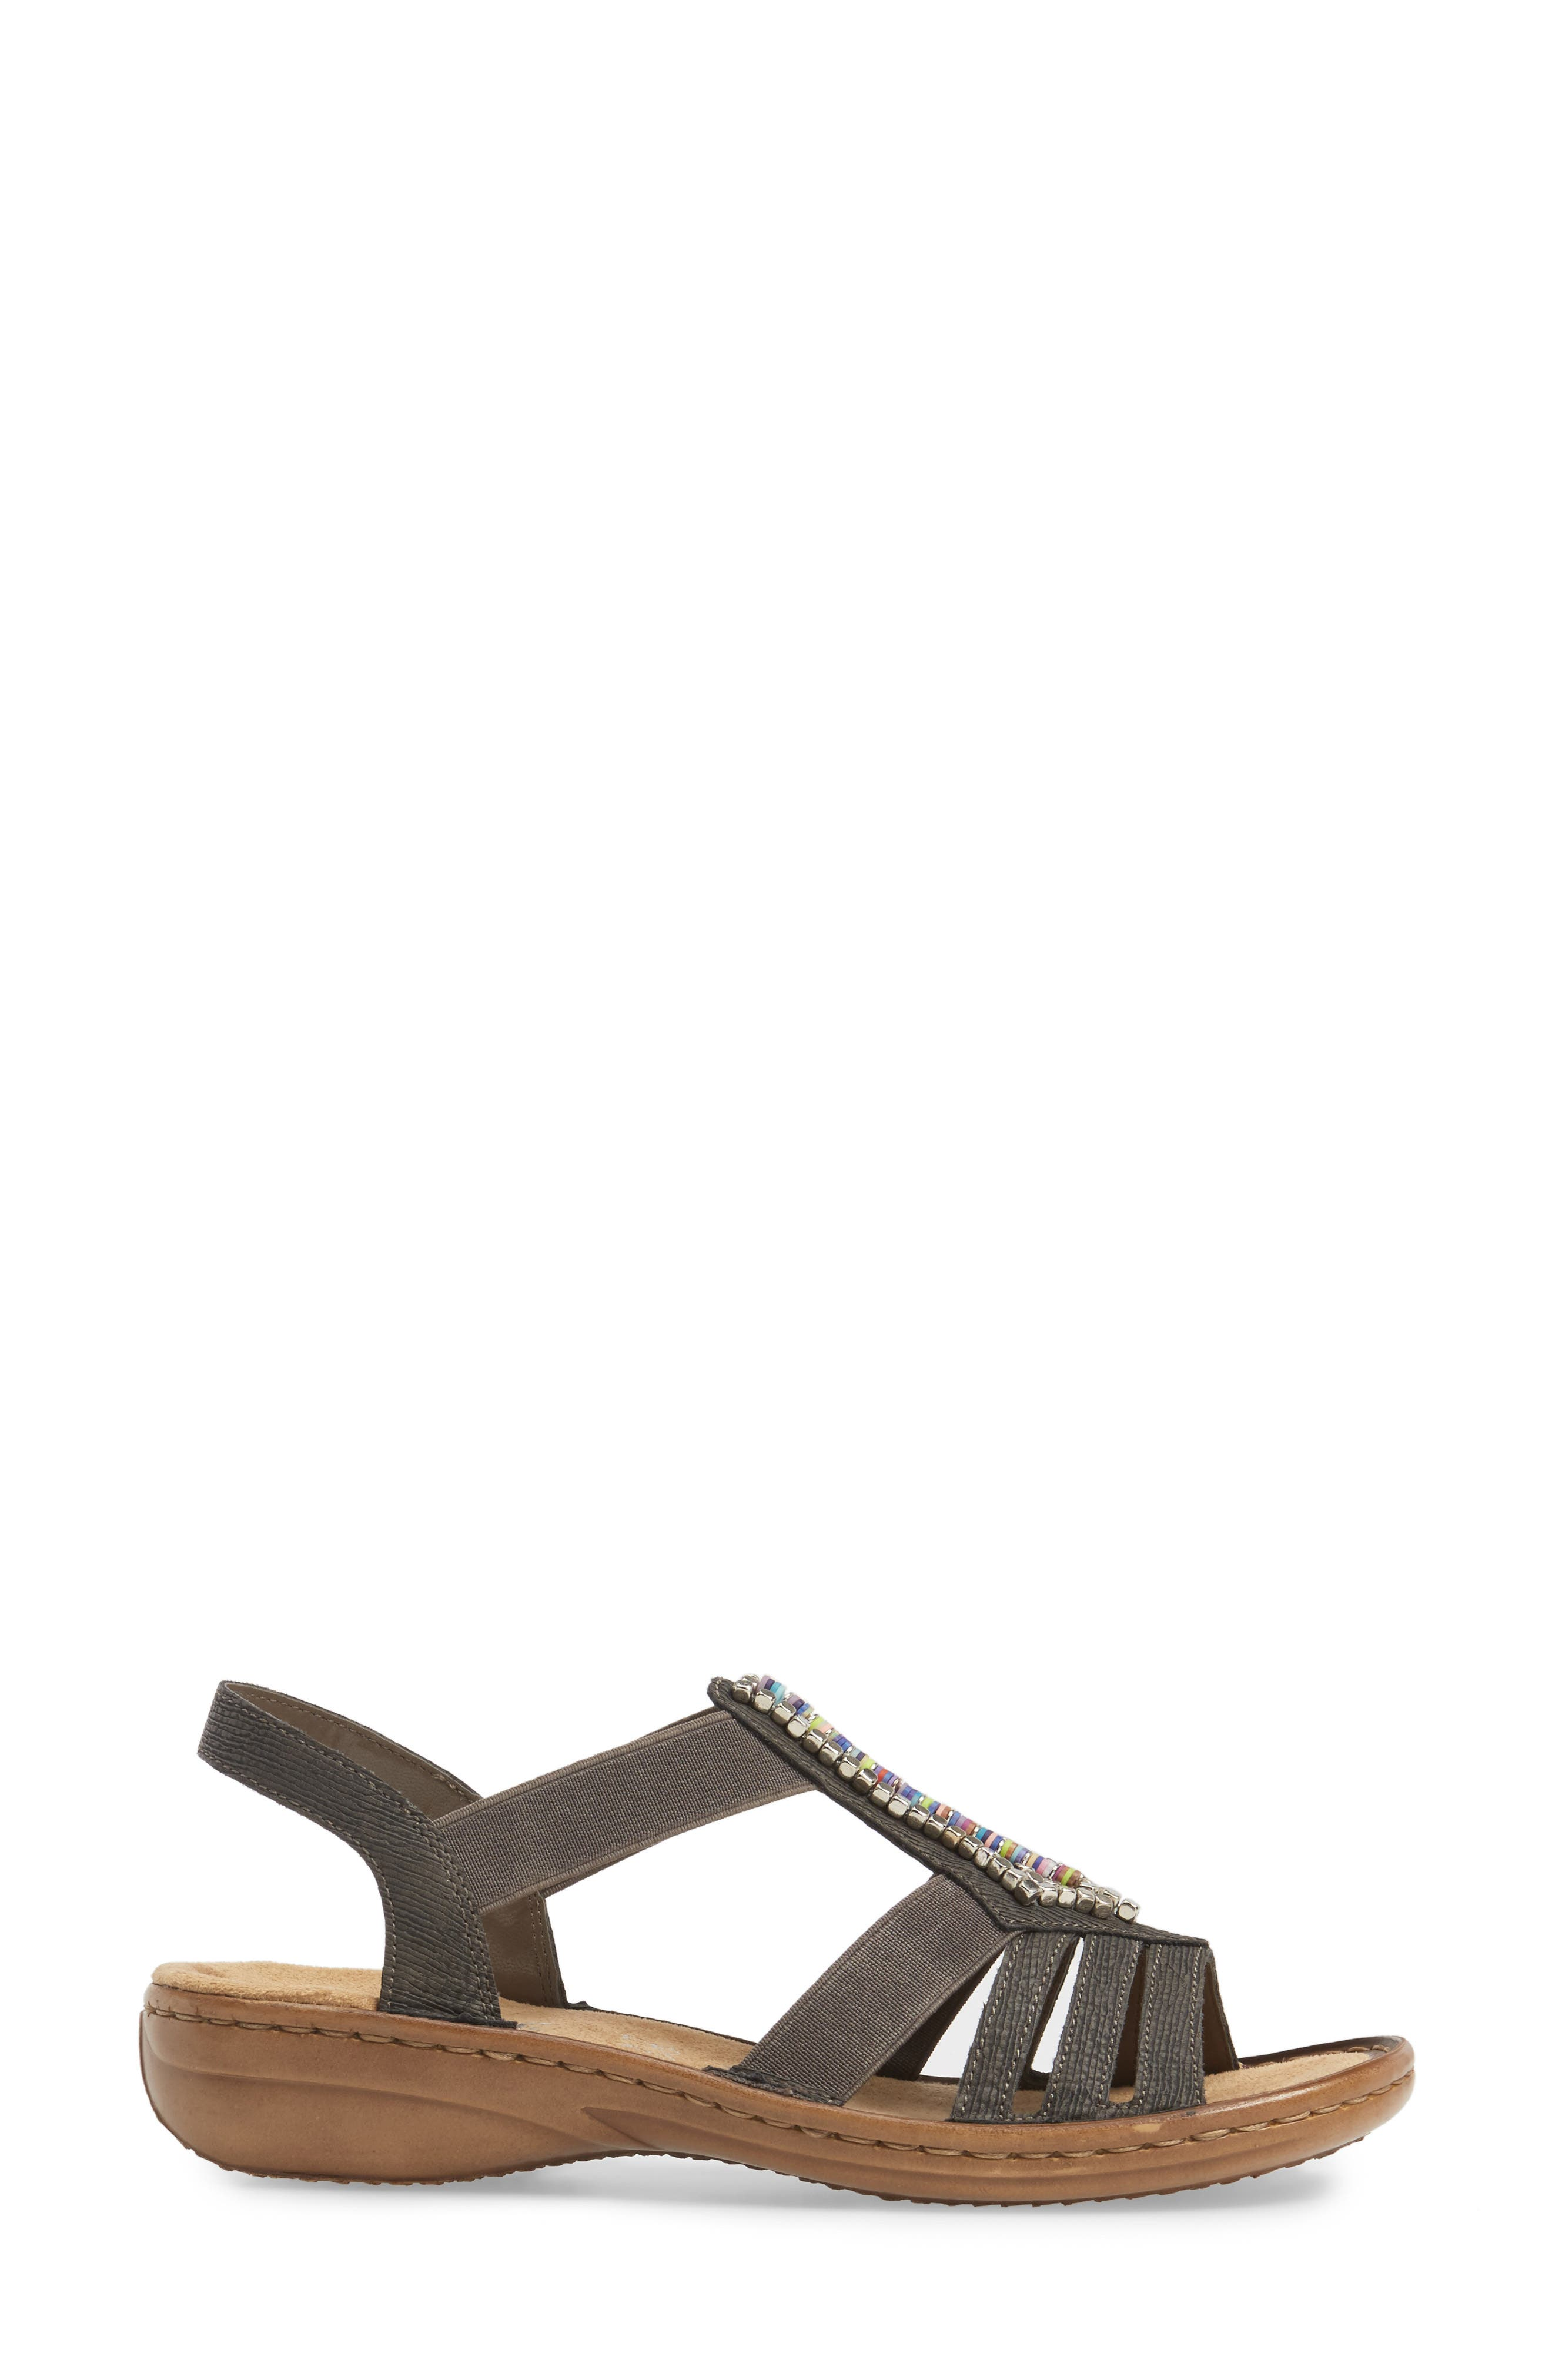 Alternate Image 3  - Rieker Antistress Regina S1 Sandal (Women)